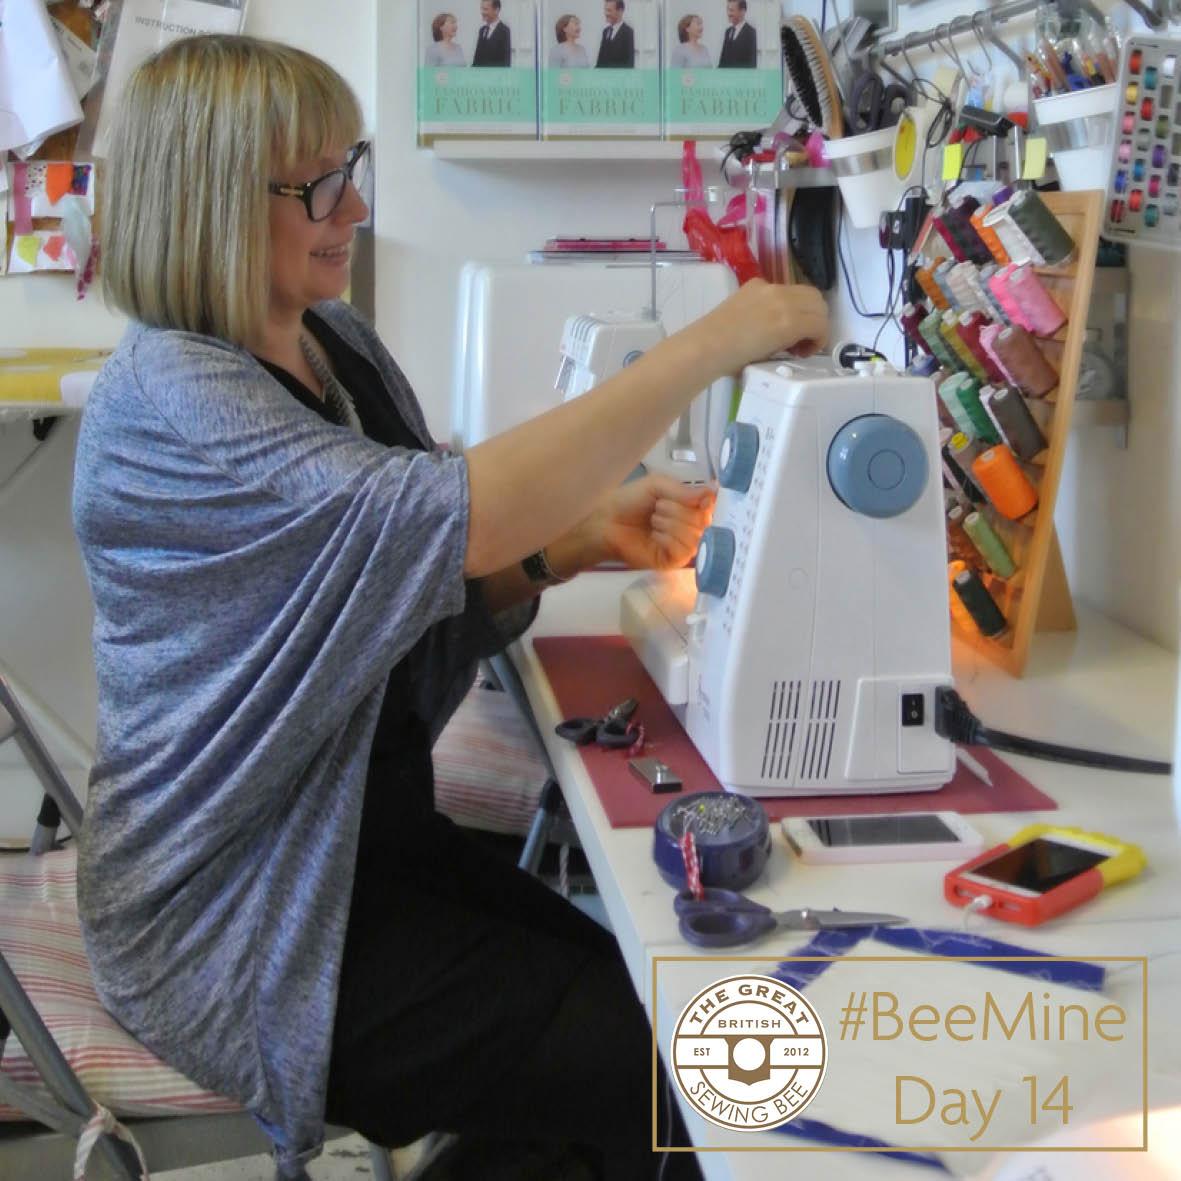 Day 14 #BeeMine- My 30 day blog challenge- Fashion With Fabric